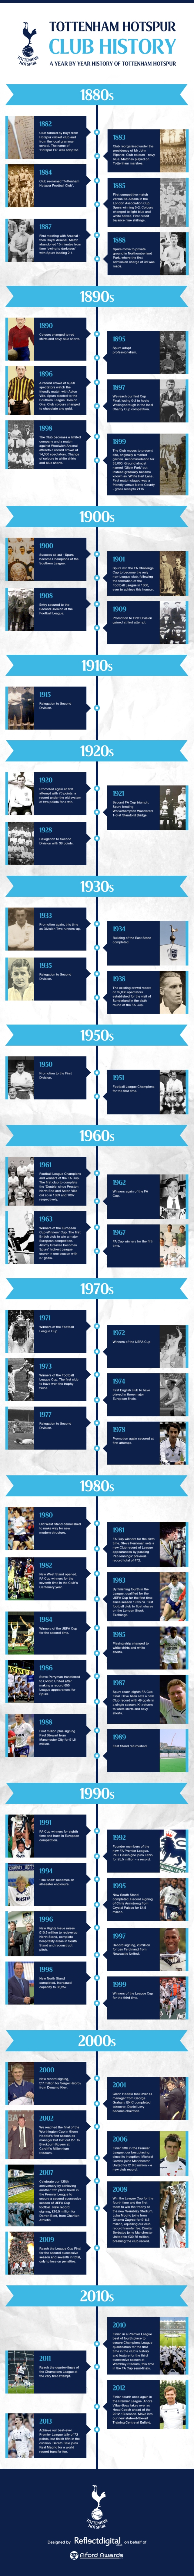 Tottenham Hotspur Club History